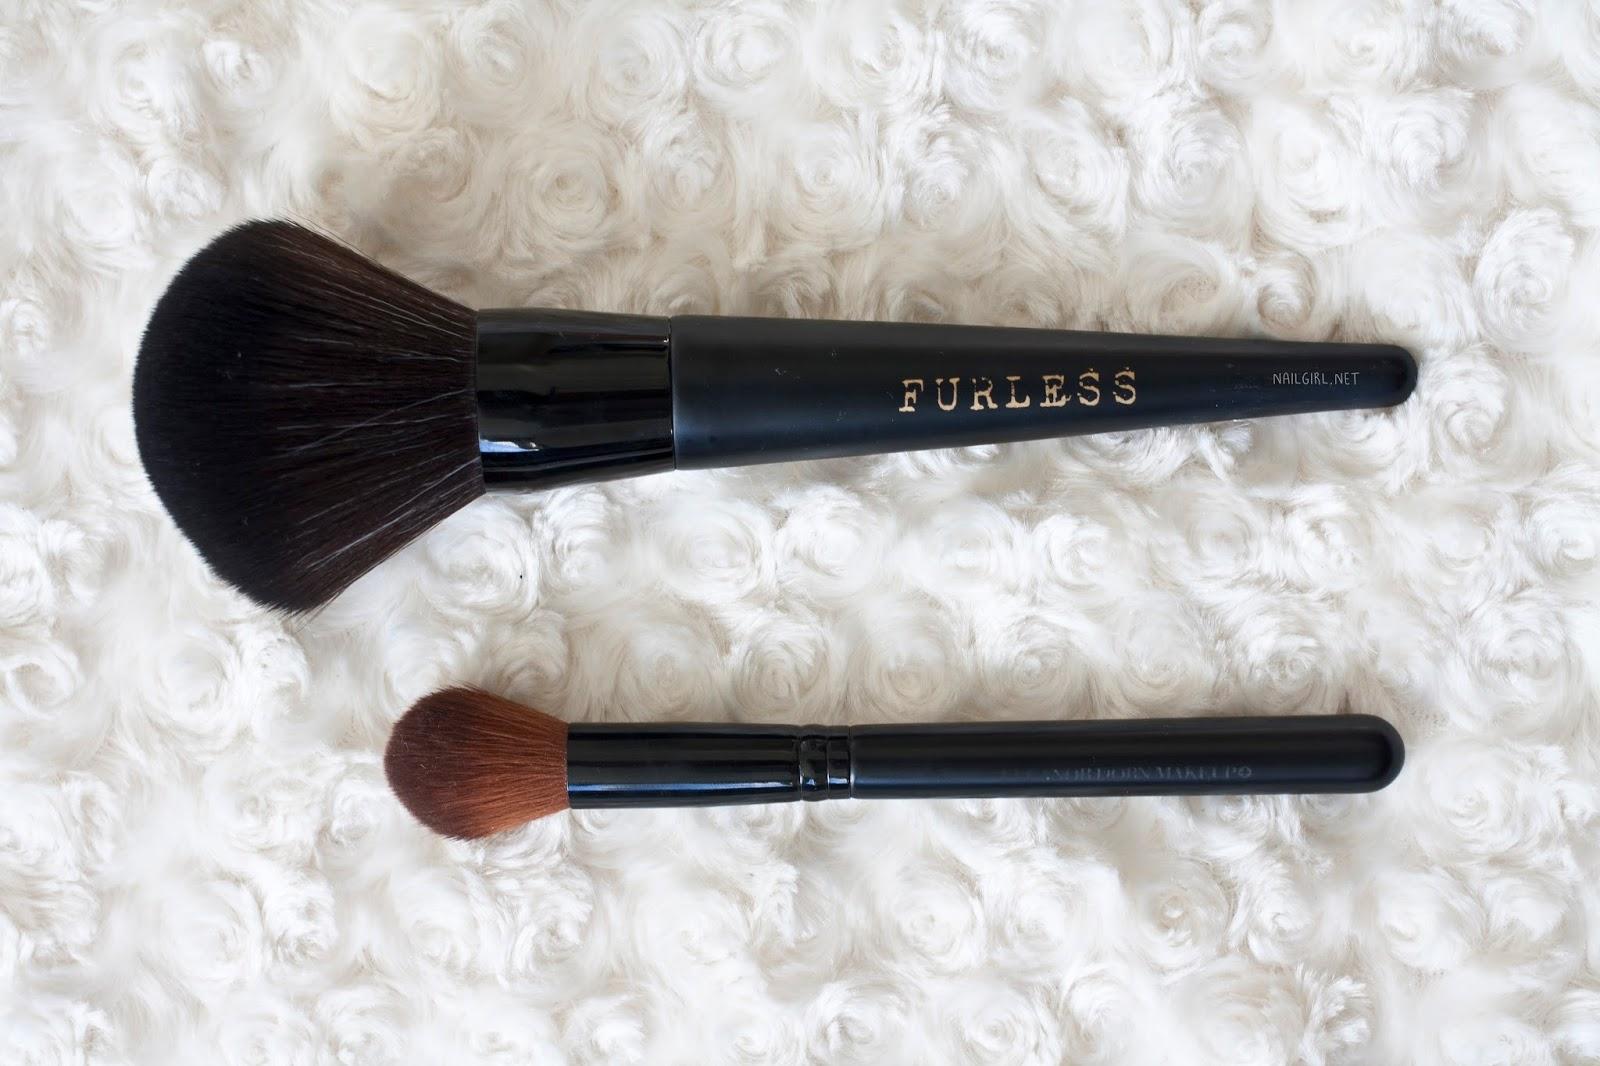 furless cosmetics makeup brush eleanor dorn